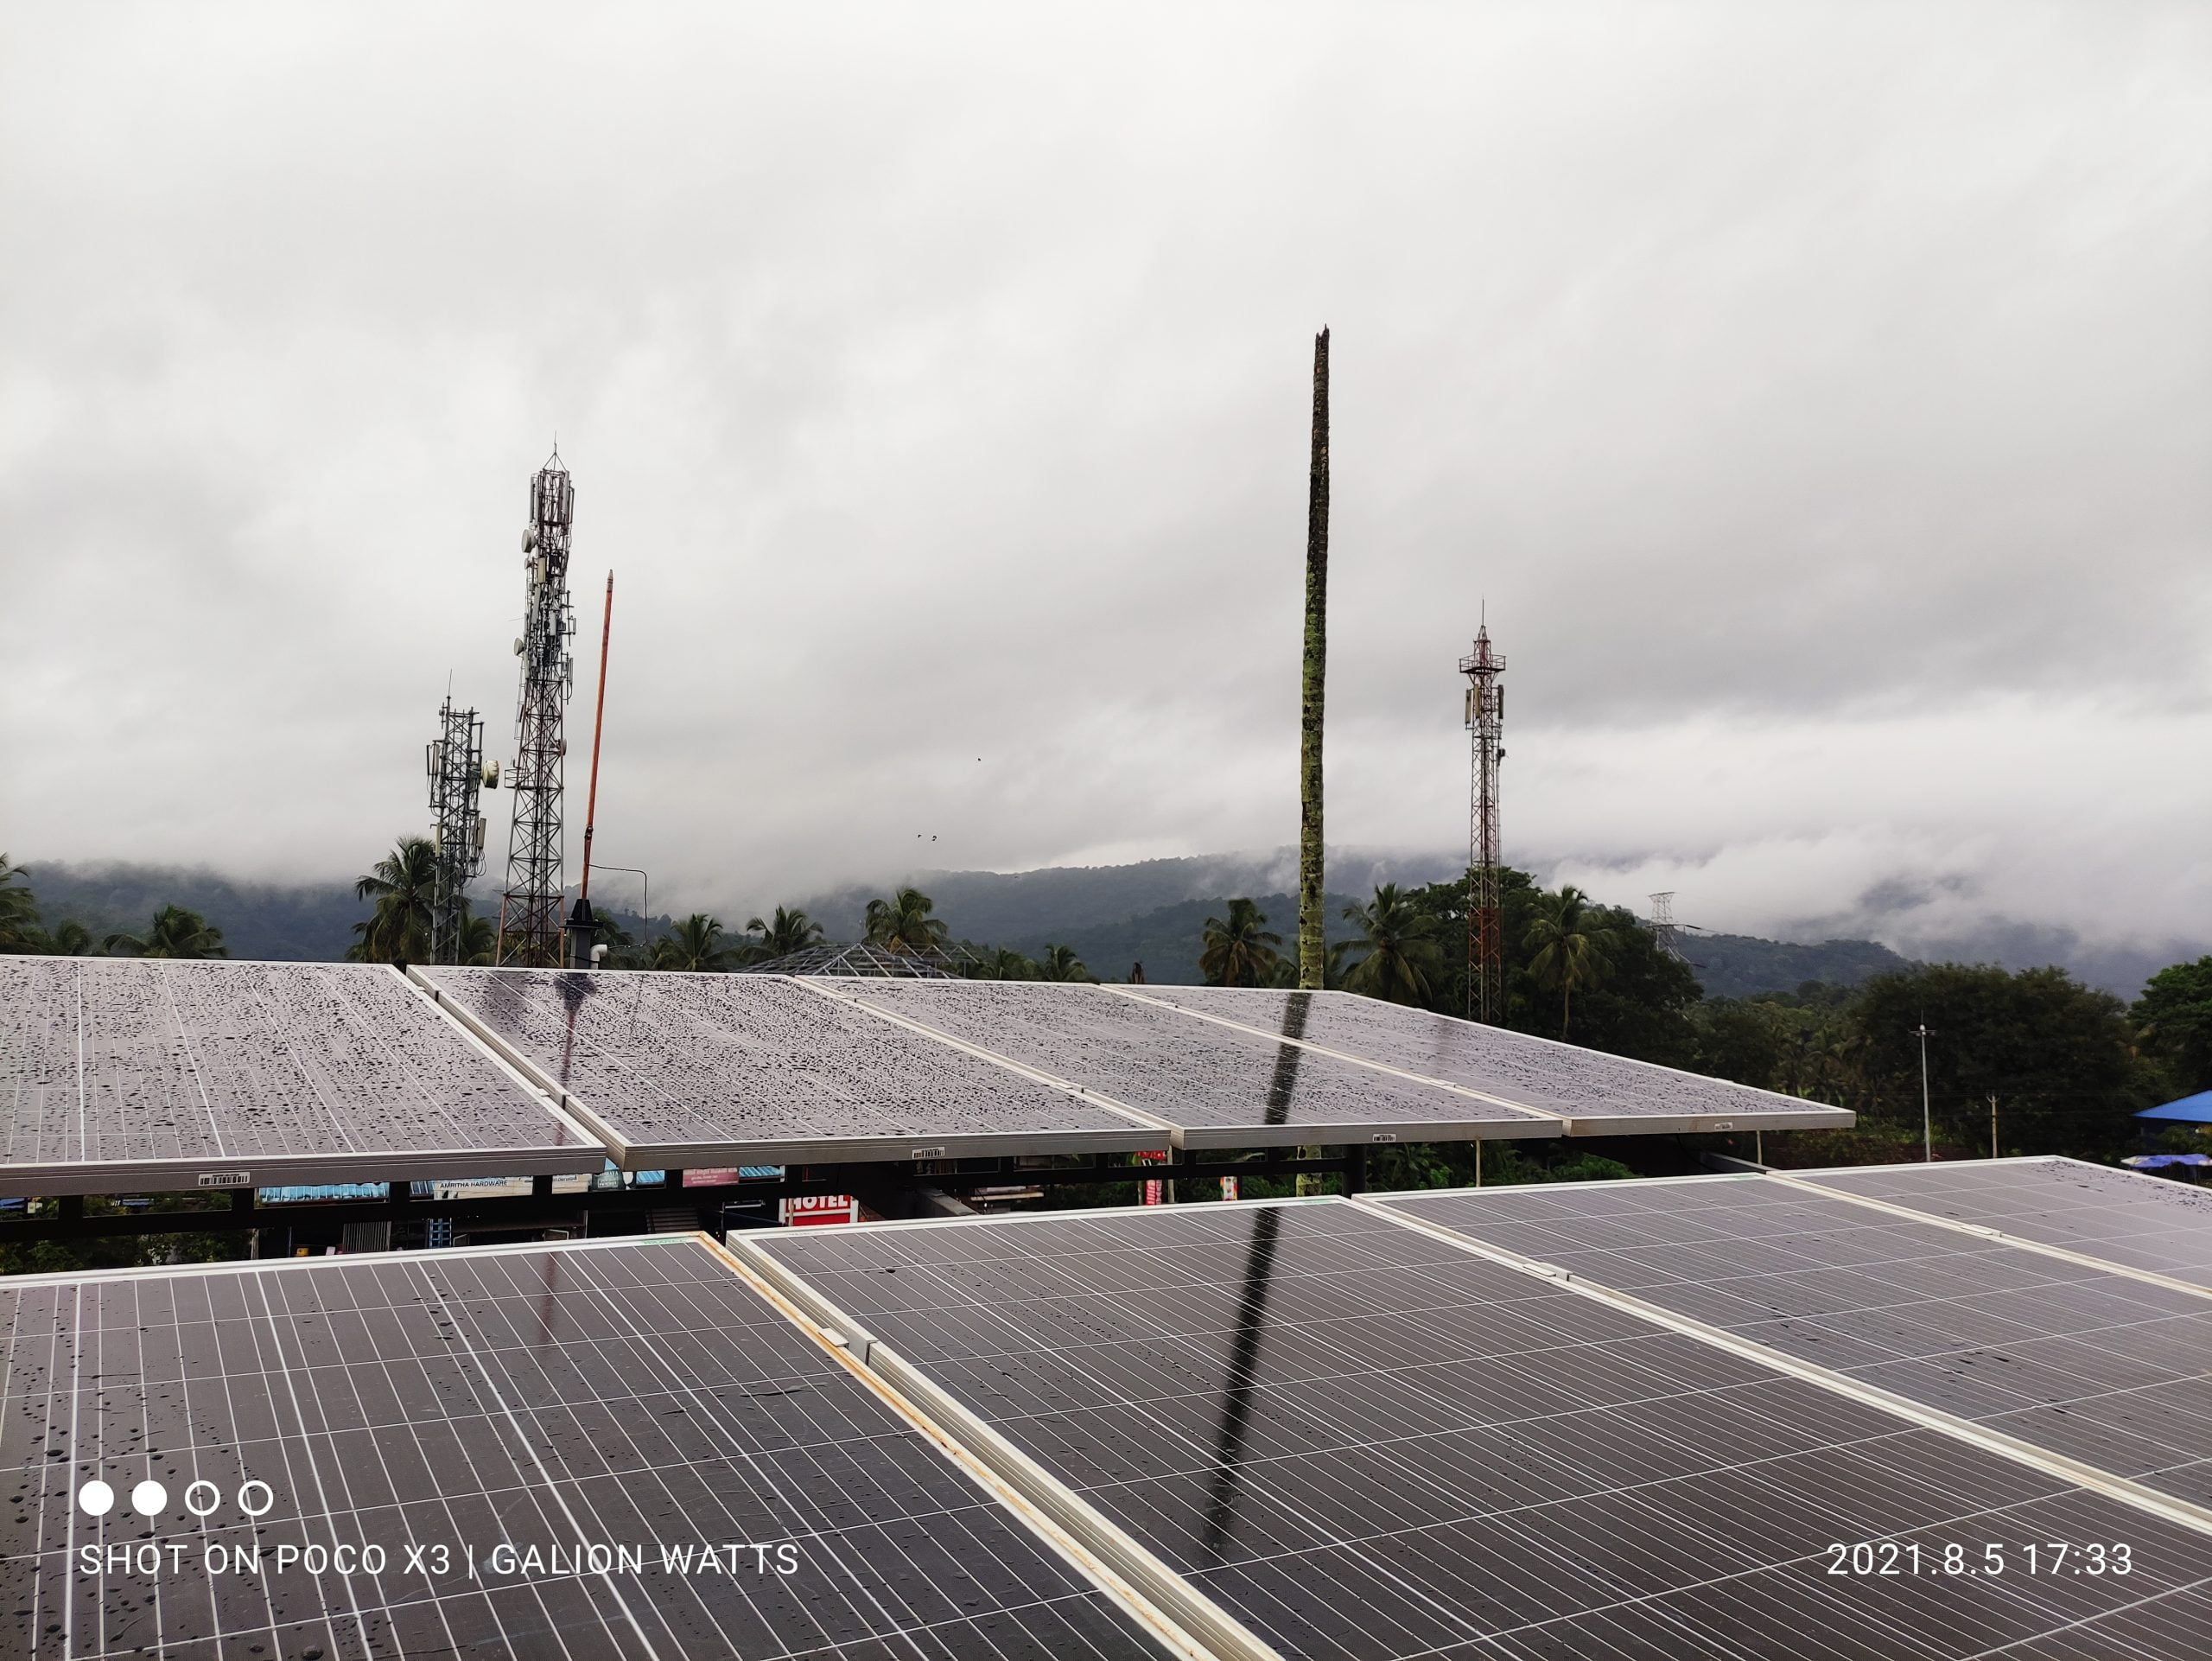 solar ongrid power plant in pattikadu